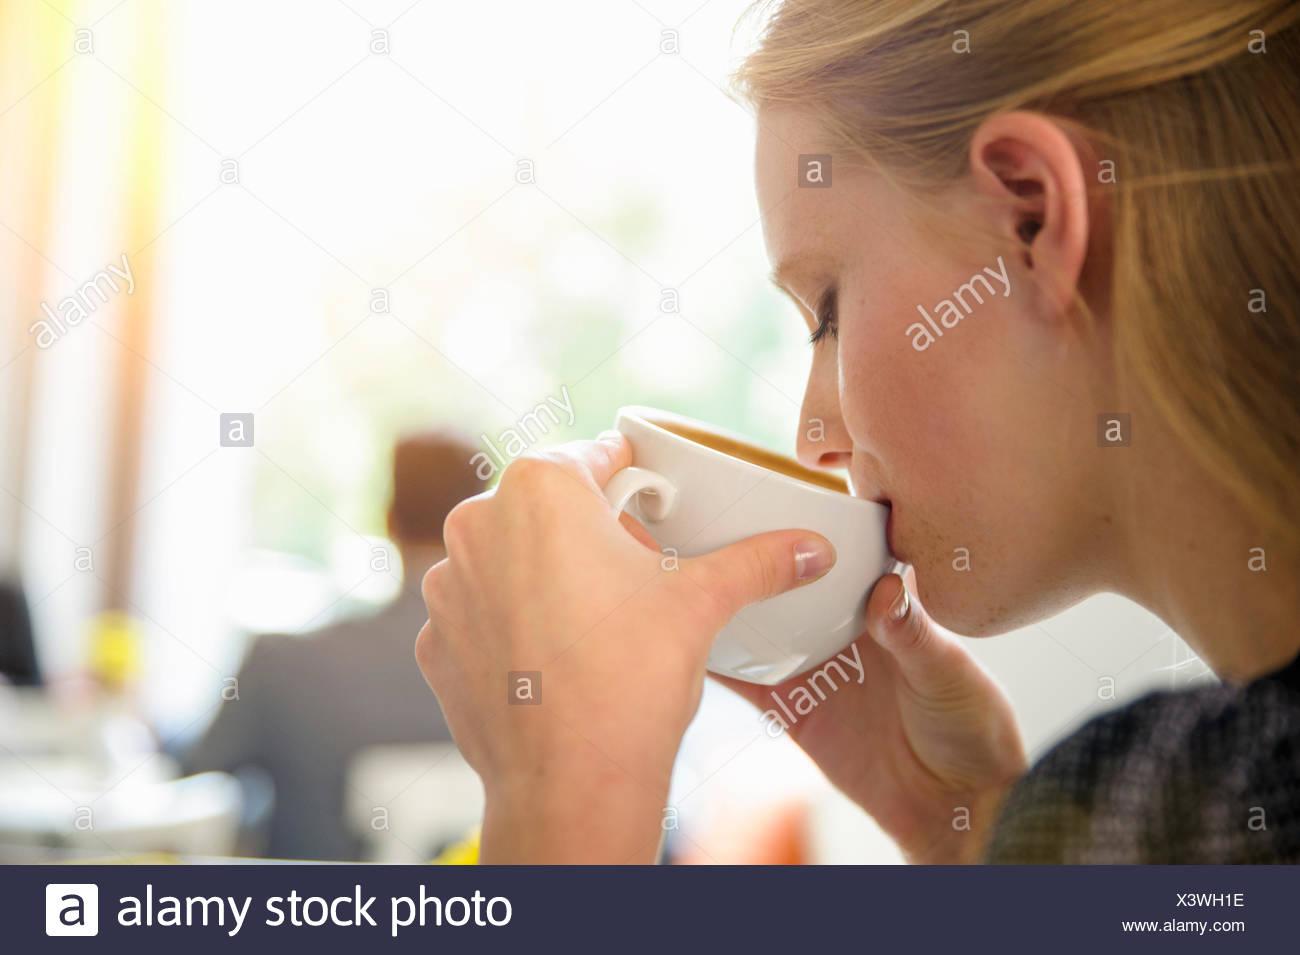 Junge Frau trinken Kaffee im Café, Nahaufnahme Stockbild